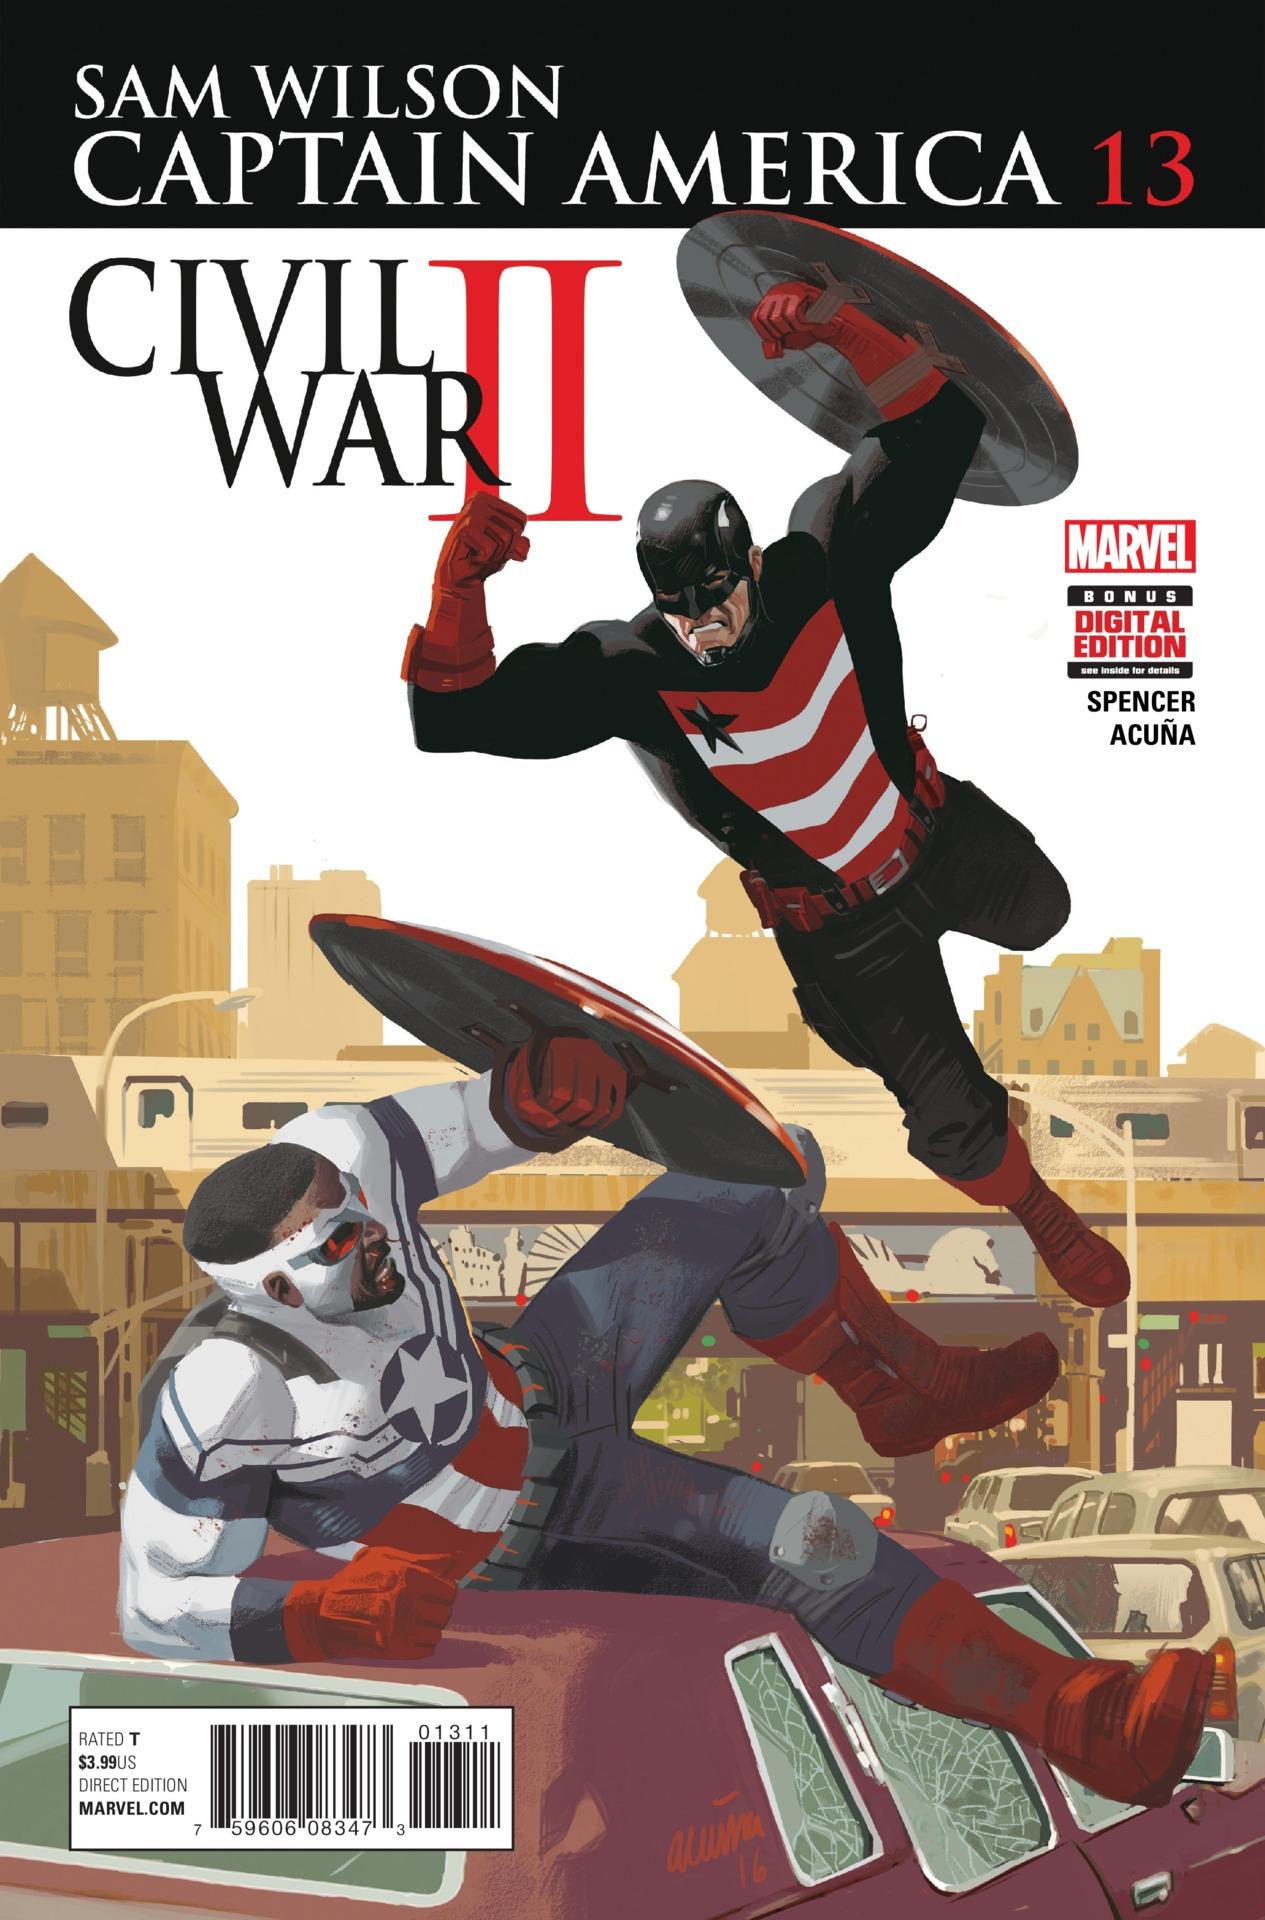 Iron Man Colors >> Captain America: Sam Wilson Vol 1 13 | Marvel Database